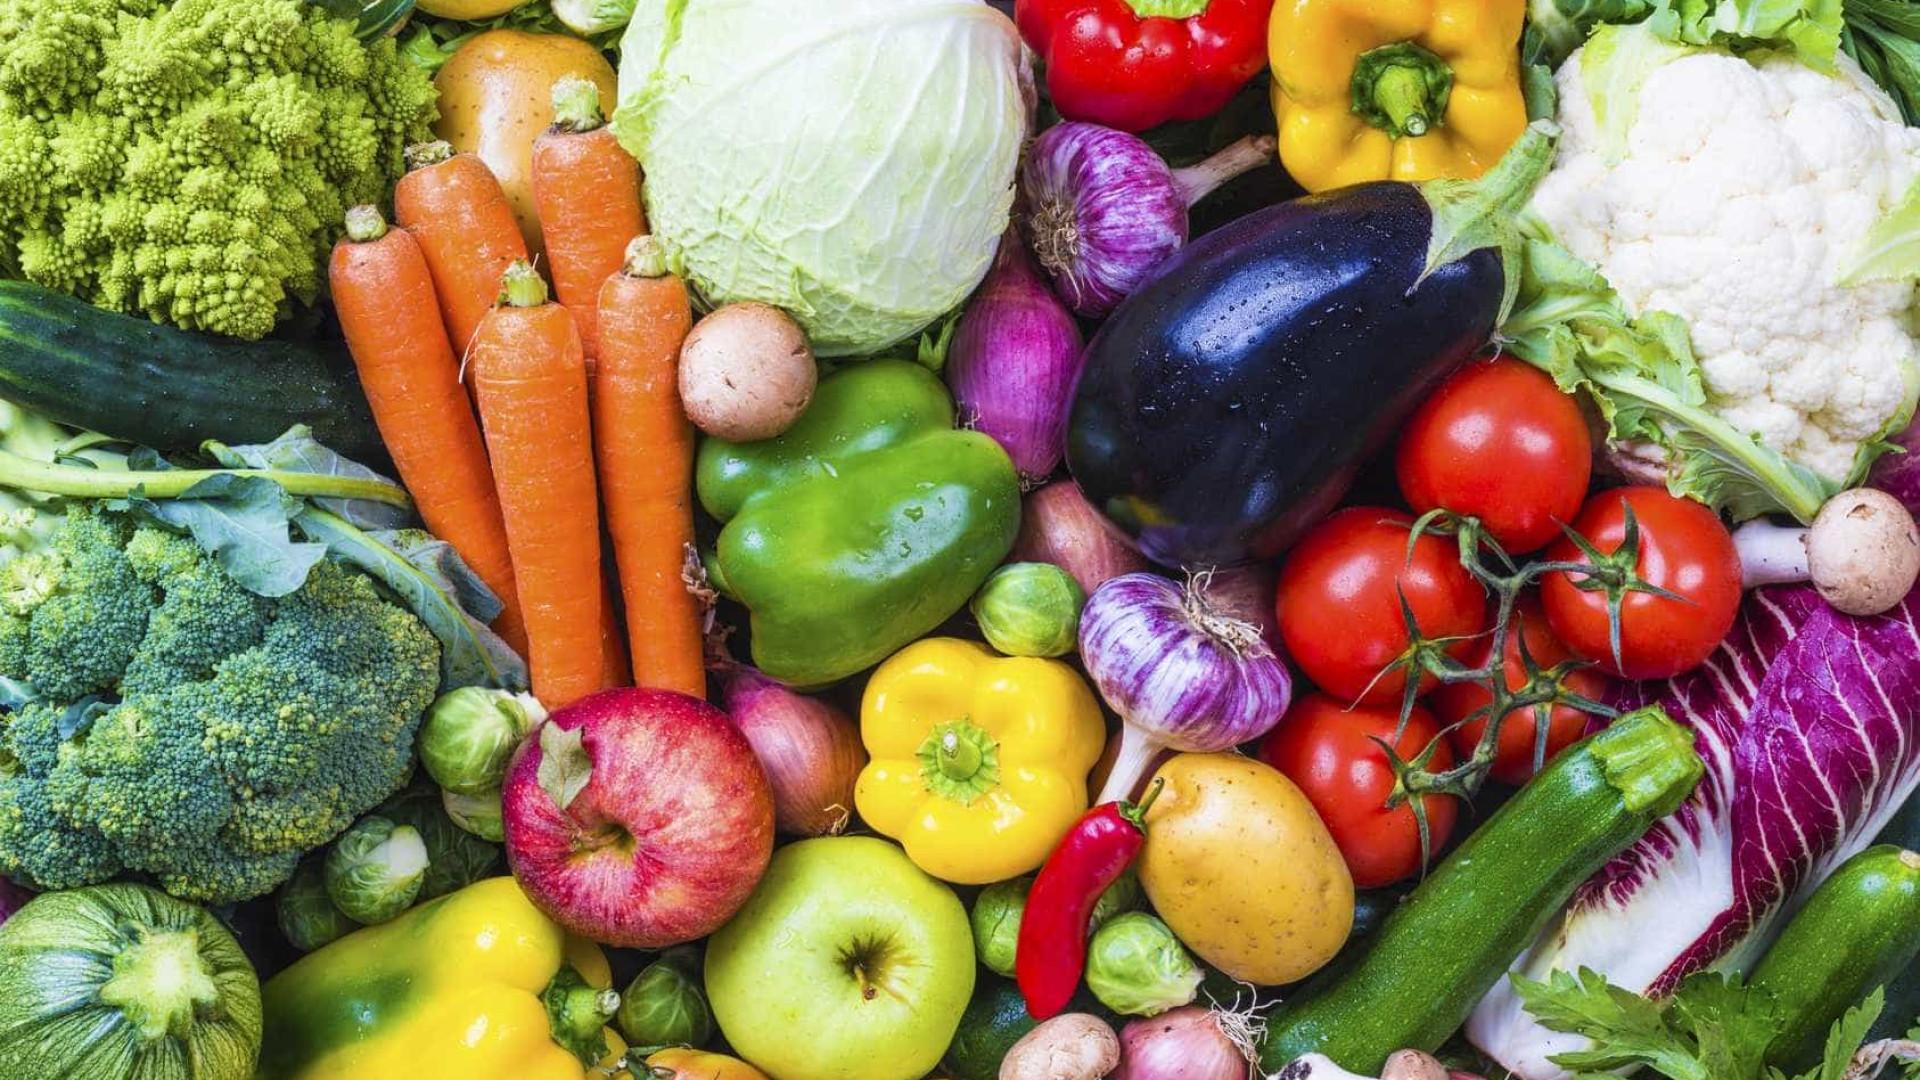 Devemos mesmo preferir alimentos orgânicos?